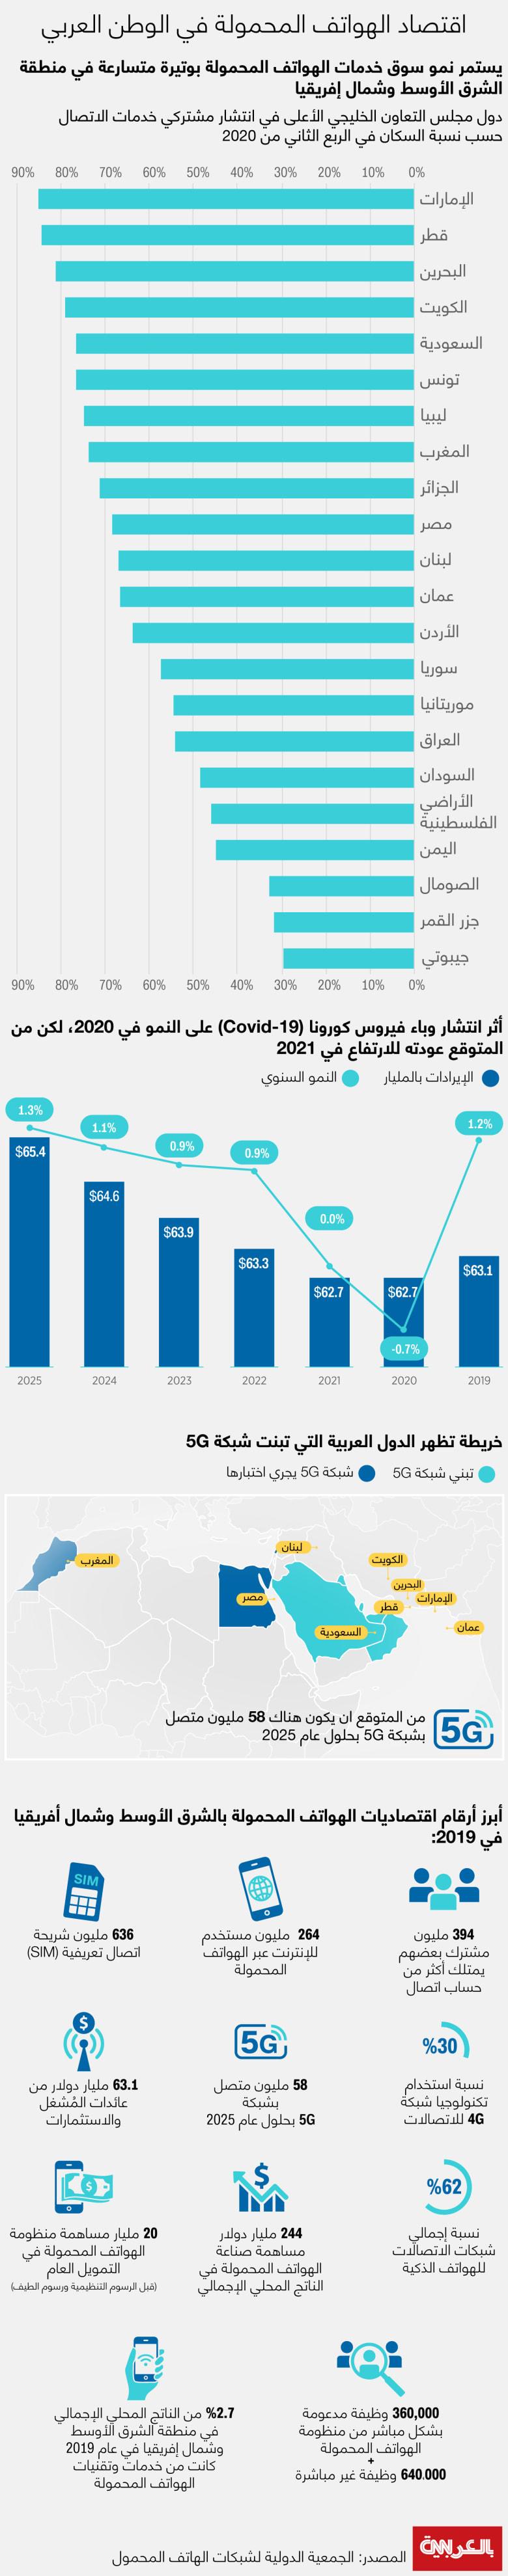 mobile-economa-2020-mena